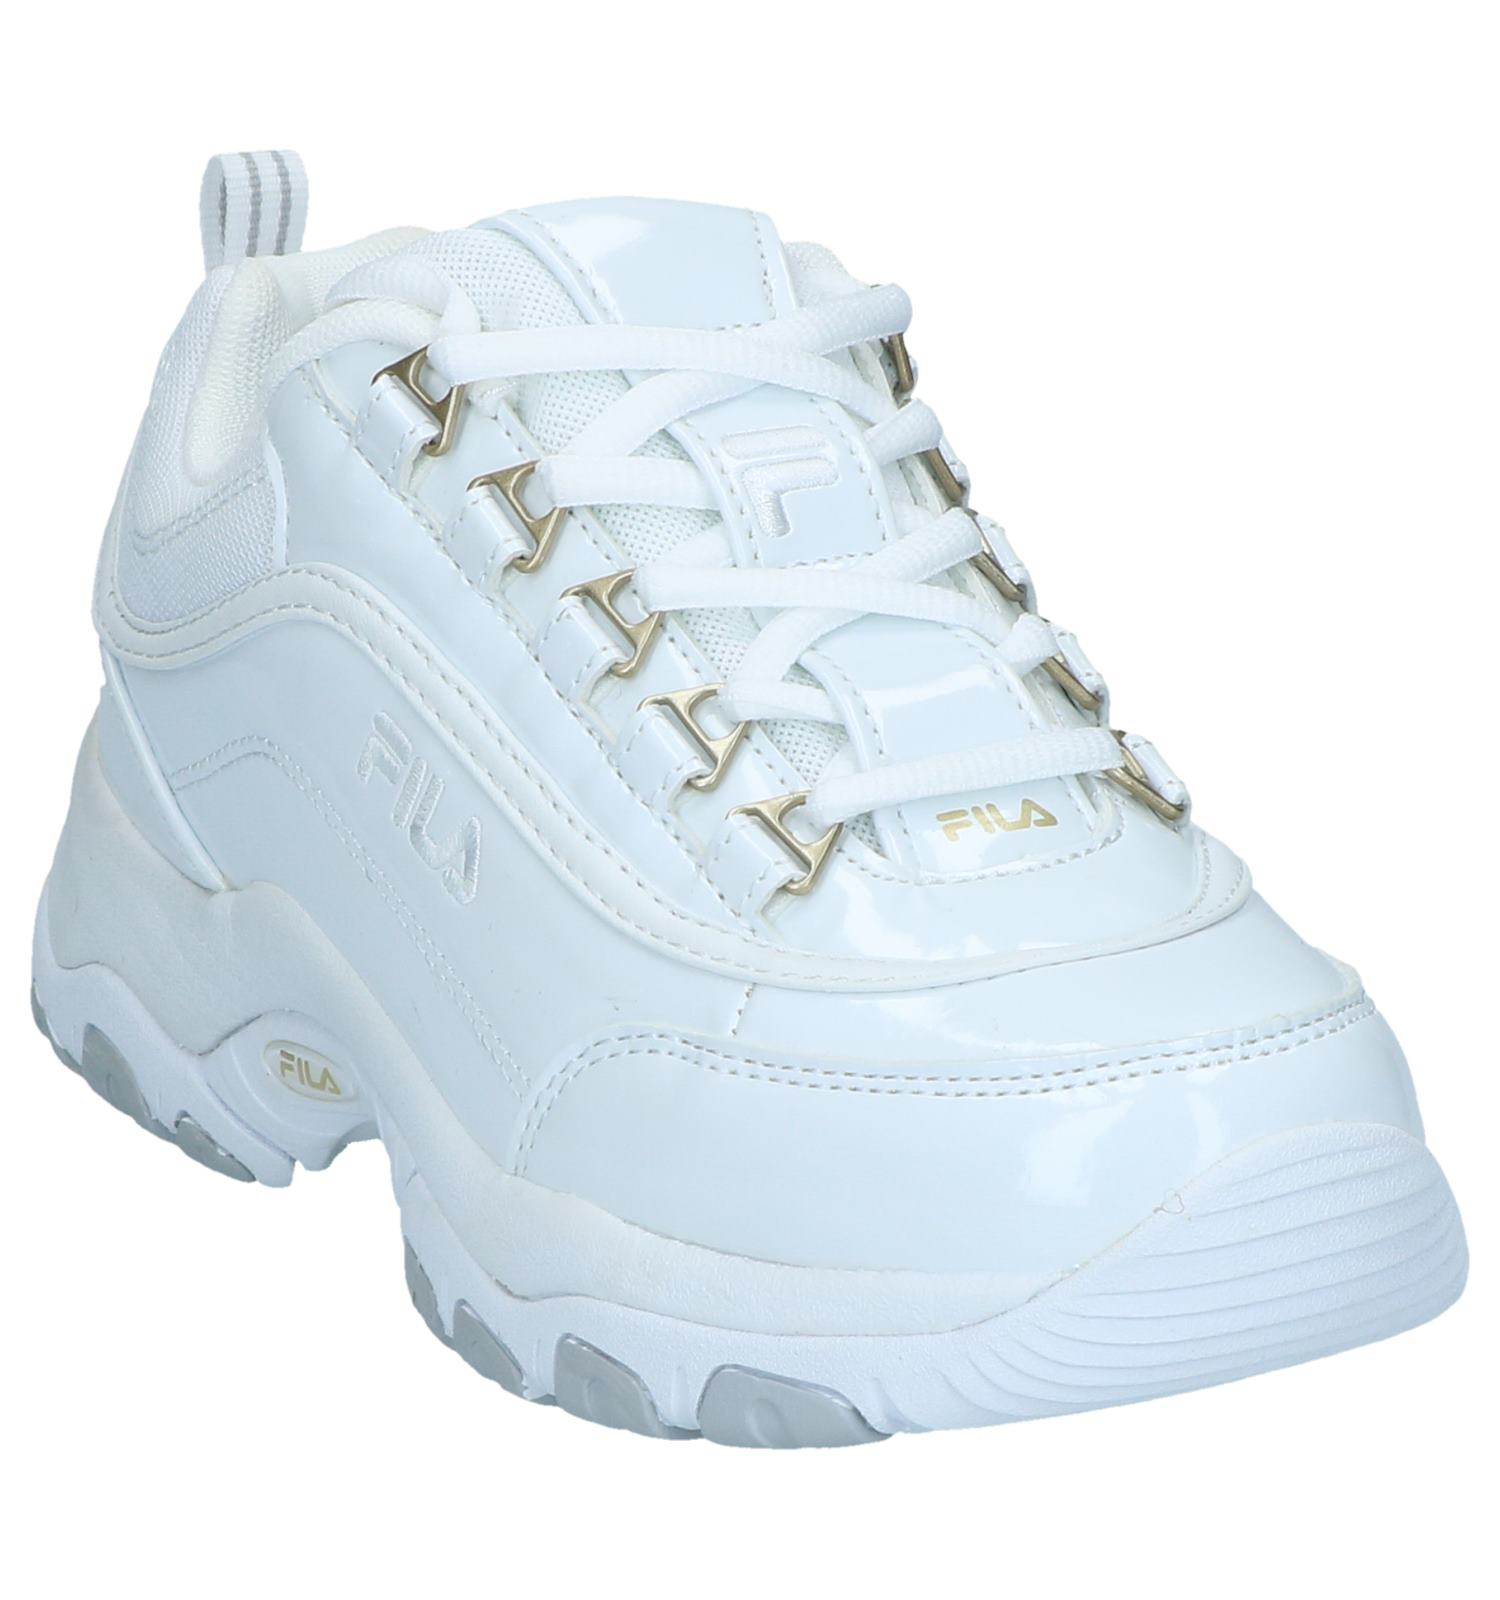 df49e9c8cbc Witte Sneakers Fila Strada Low   TORFS.BE   Gratis verzend en retour